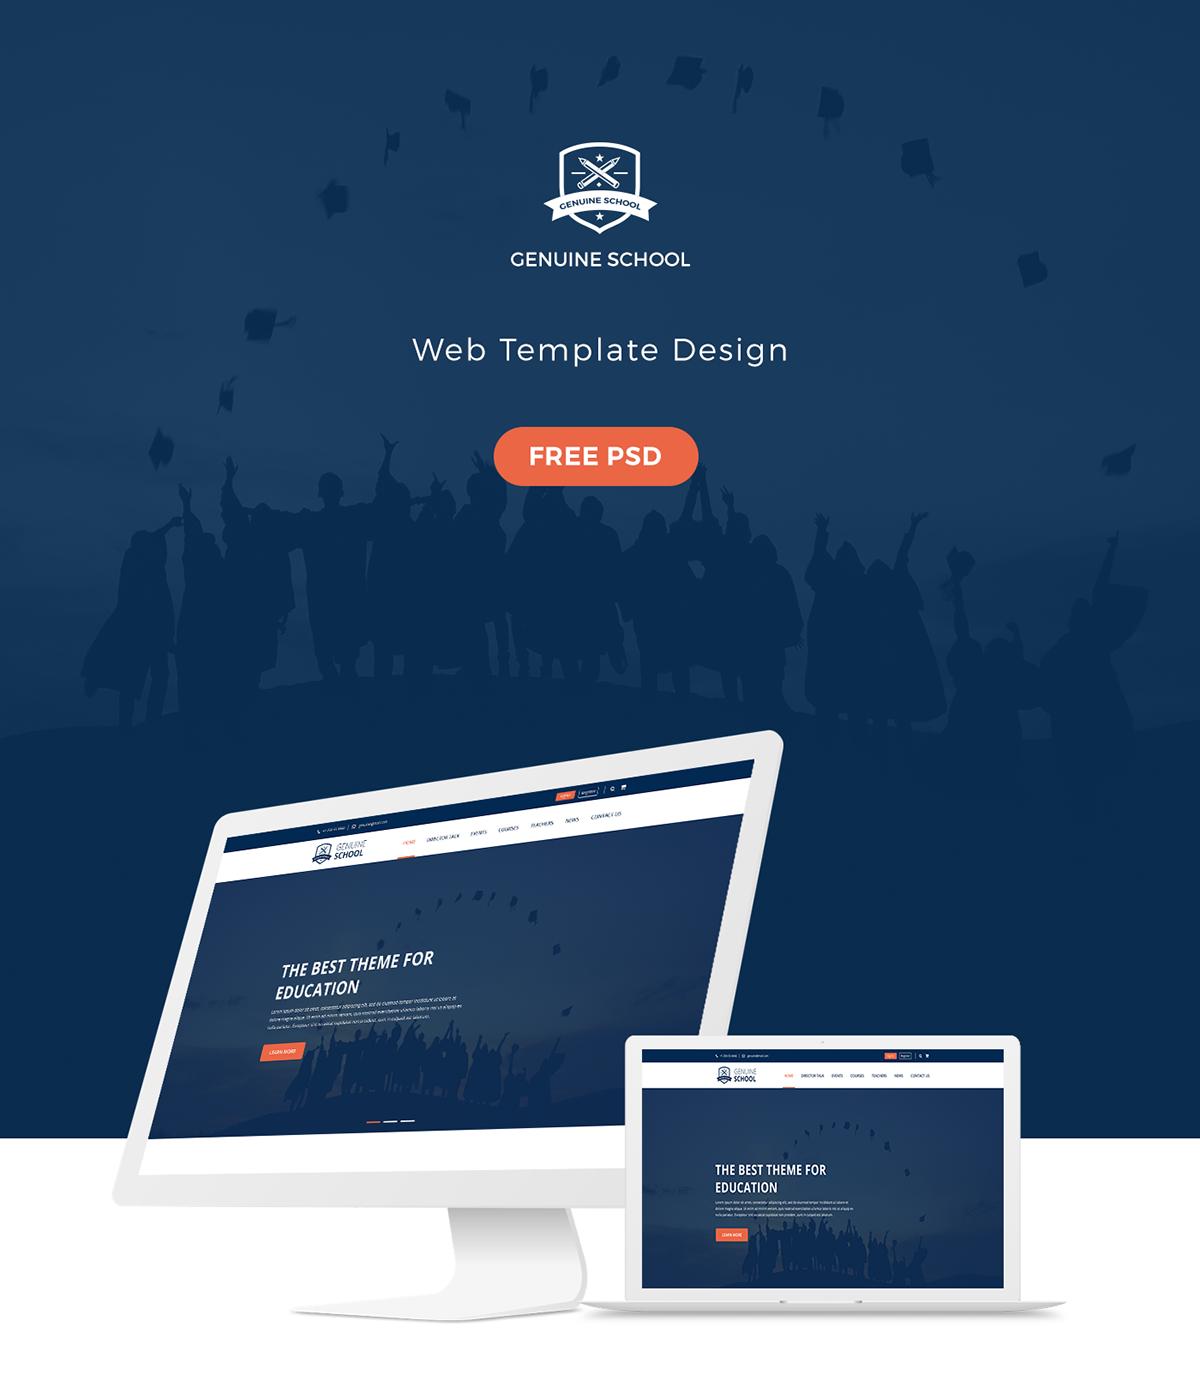 Genuine School Web Template Free Psd Download On Wacom Gallery